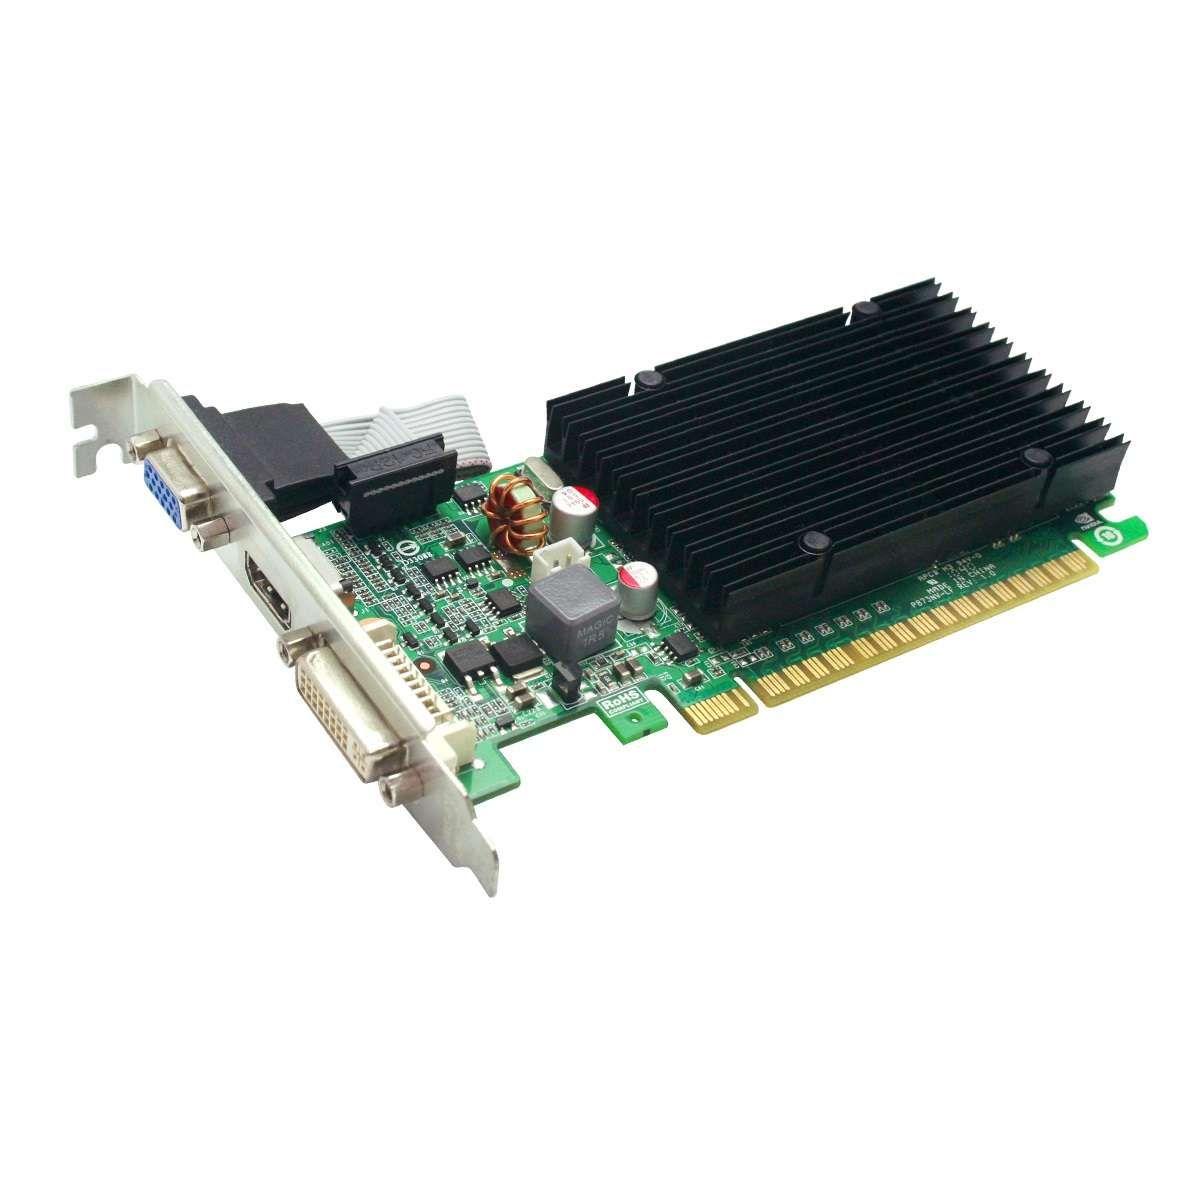 Placa de Vídeo EVGA GeForce 8400GS 1GB DDR3 64 Bits - 01G-P3-1303-KR